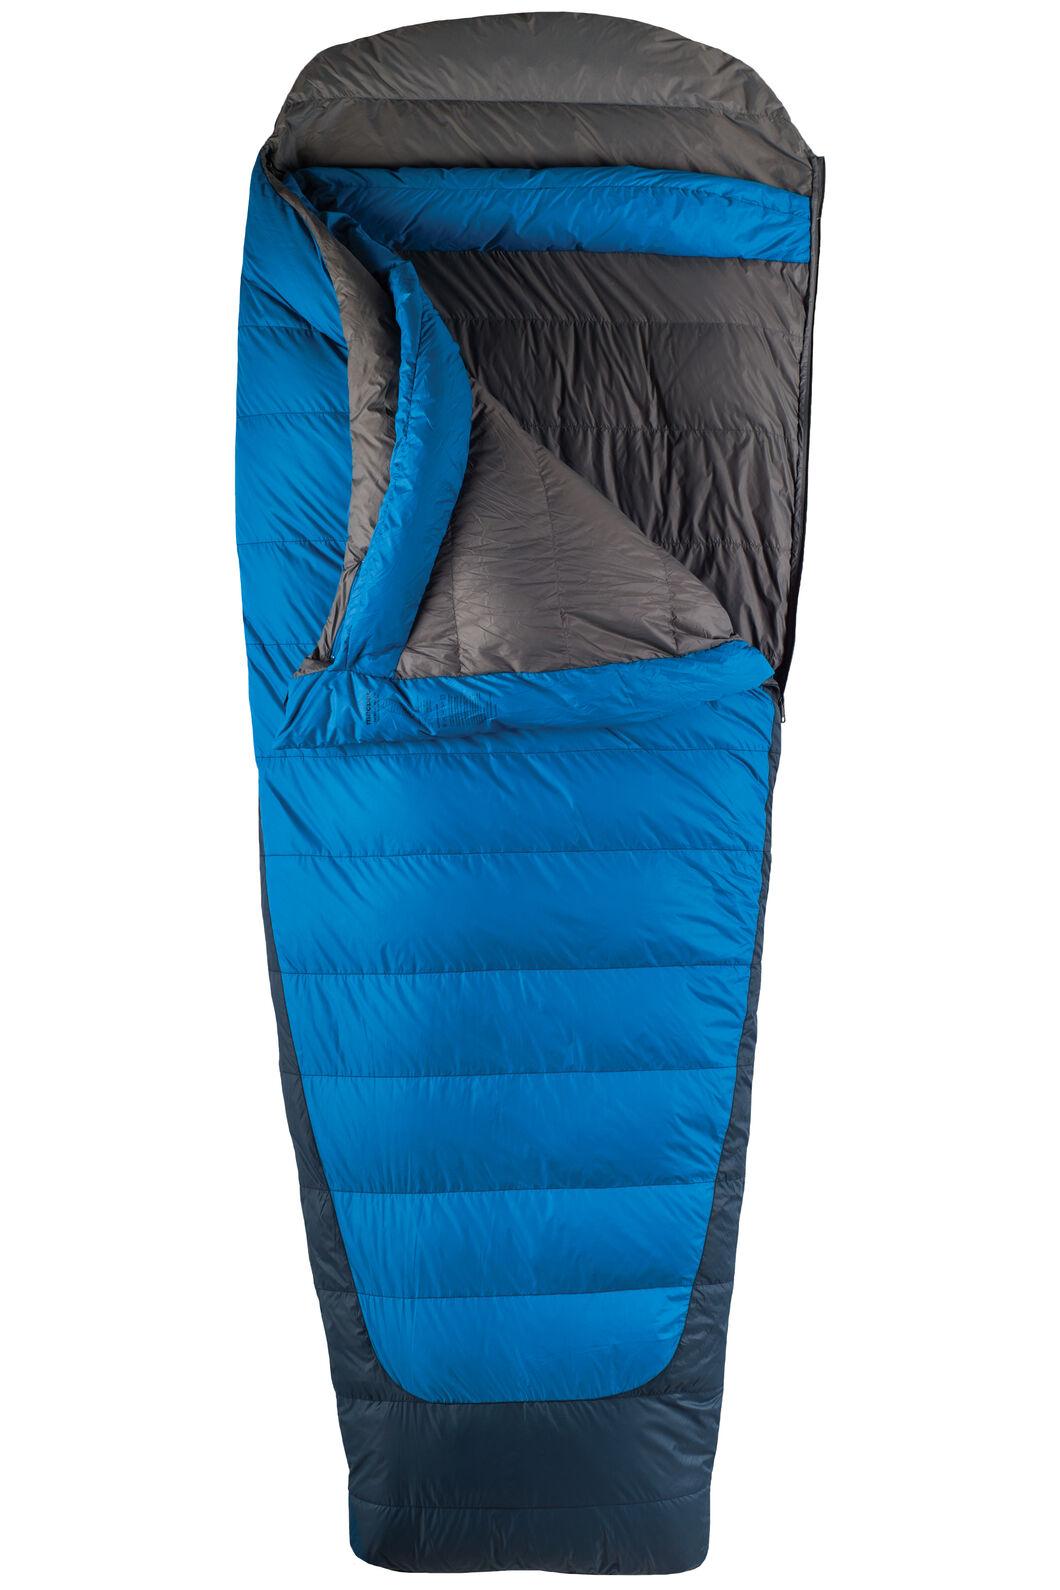 Macpac Escapade Down 350 Sleeping Bag - Extra Large, Classic Blue, hi-res